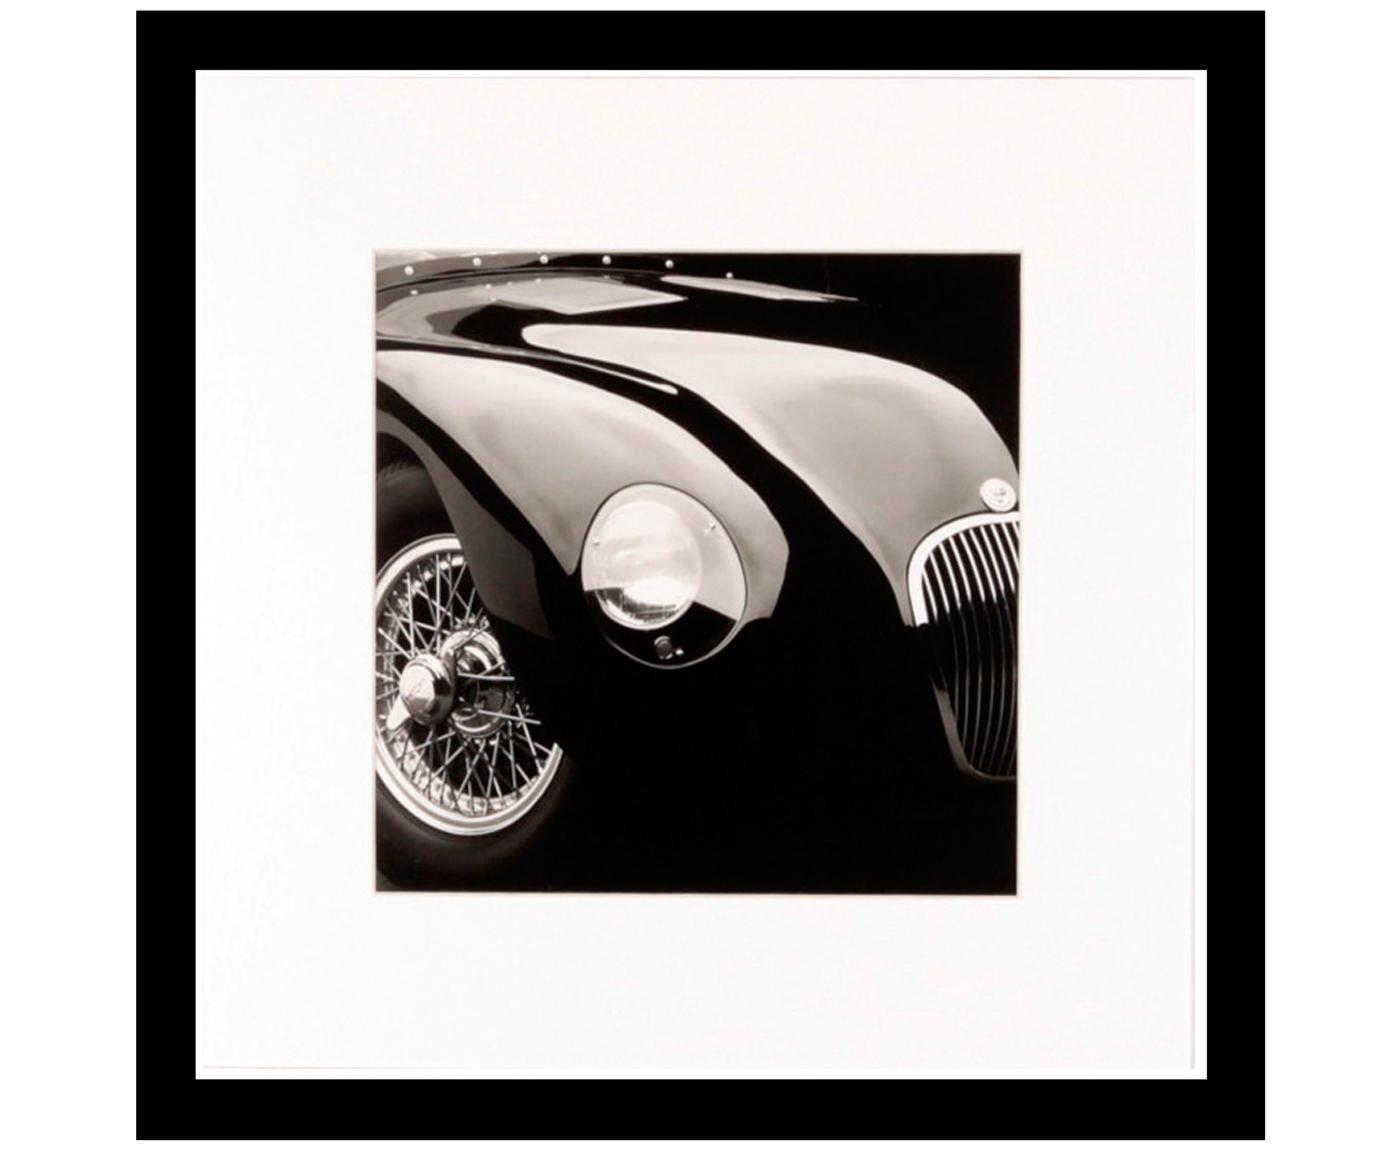 Ingelijste digitale print Oldtimer II, Afbeelding: digitale print, Lijst: kunststof, Afbeelding: zwart, wit<br>Lijst: zwart , 30 x 30 cm